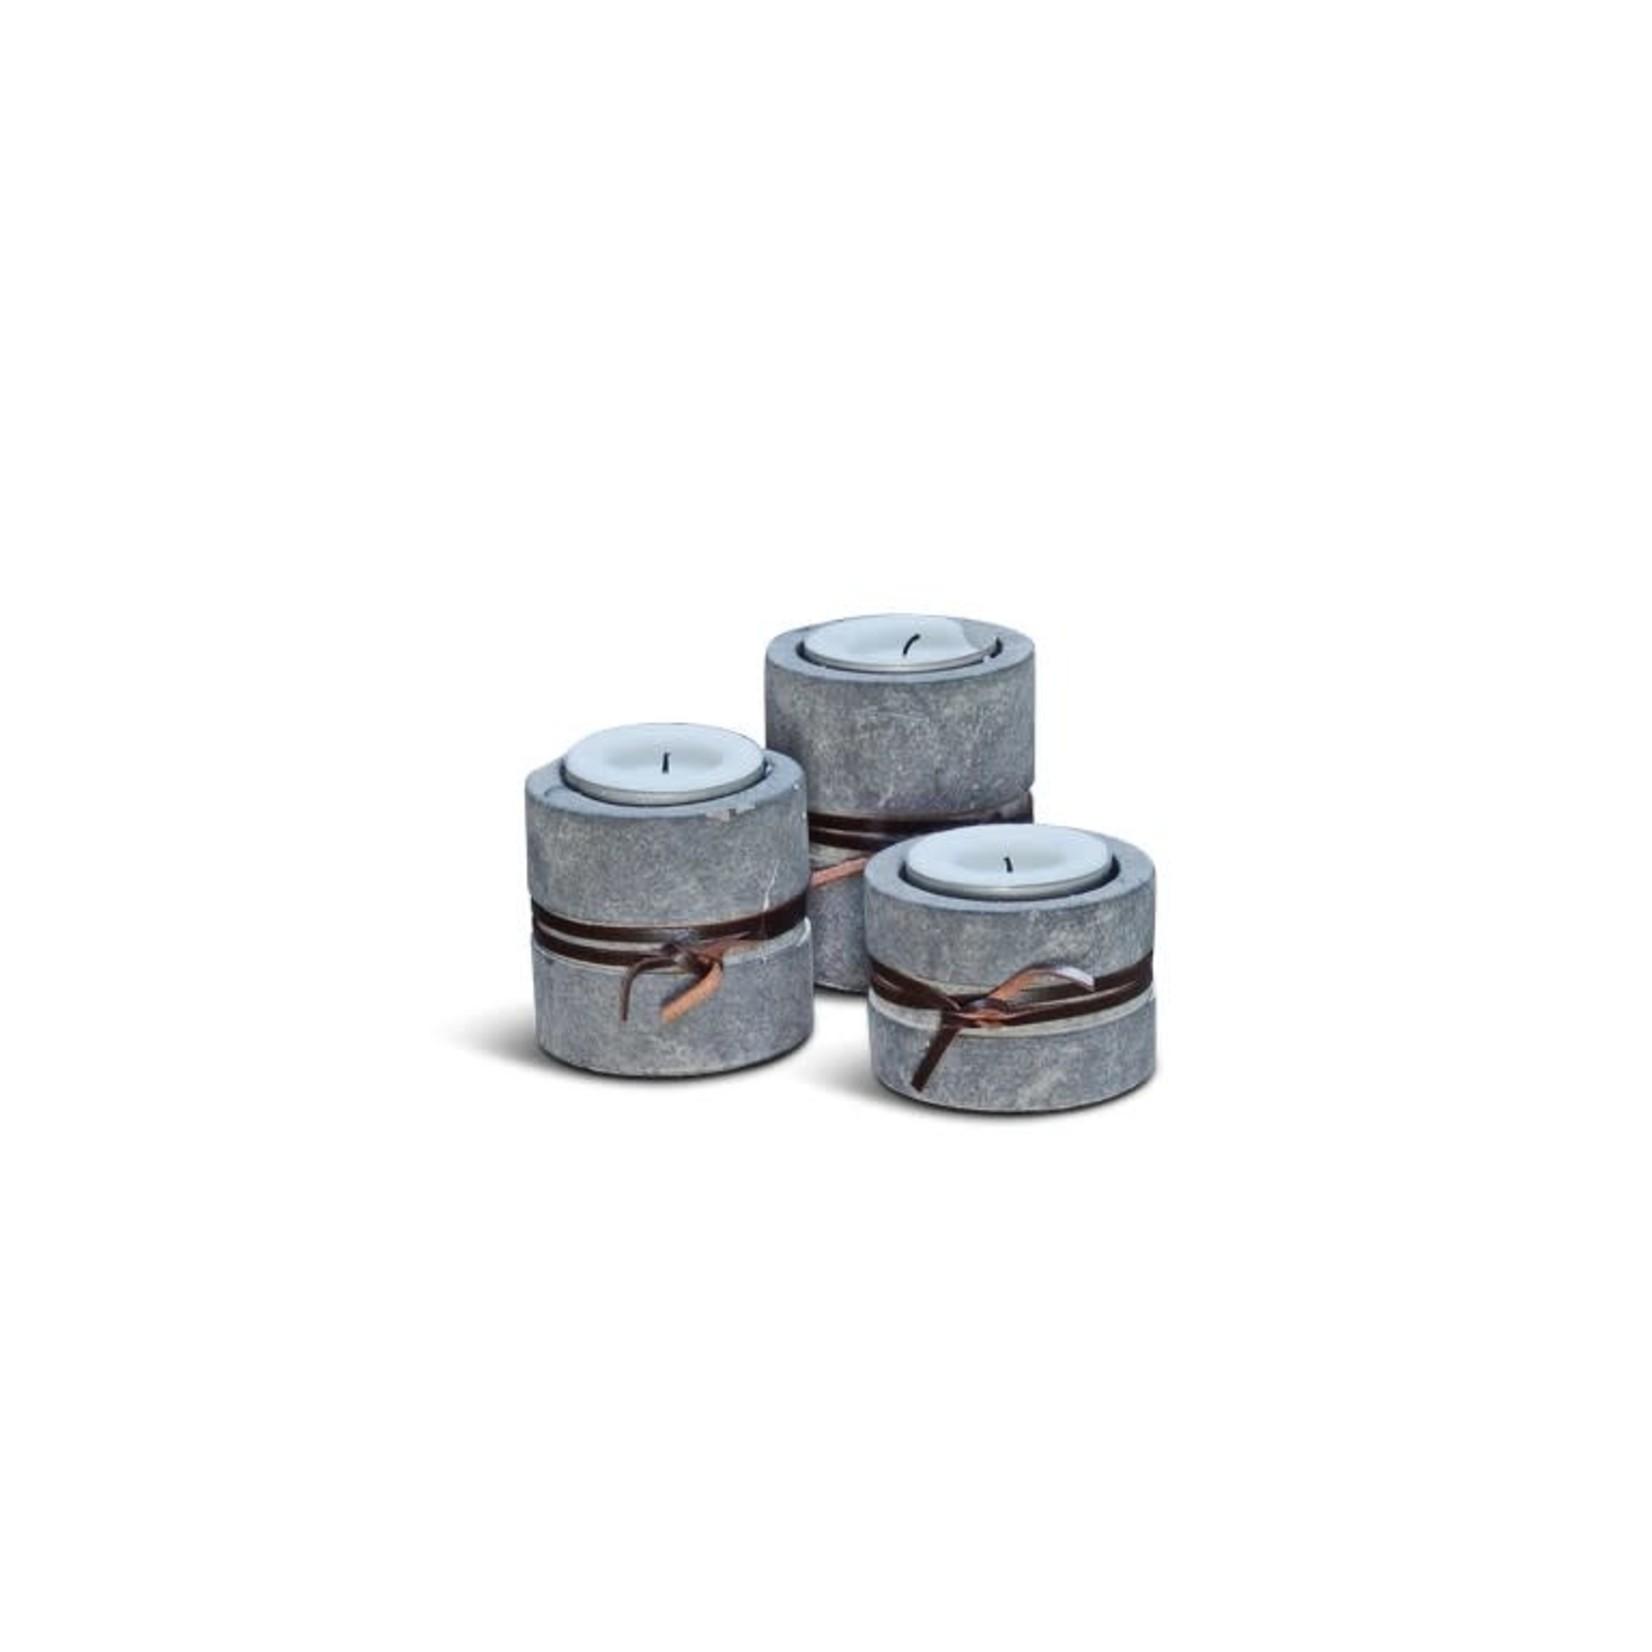 Brynxz Brynxz | Candleholder medium (pst)